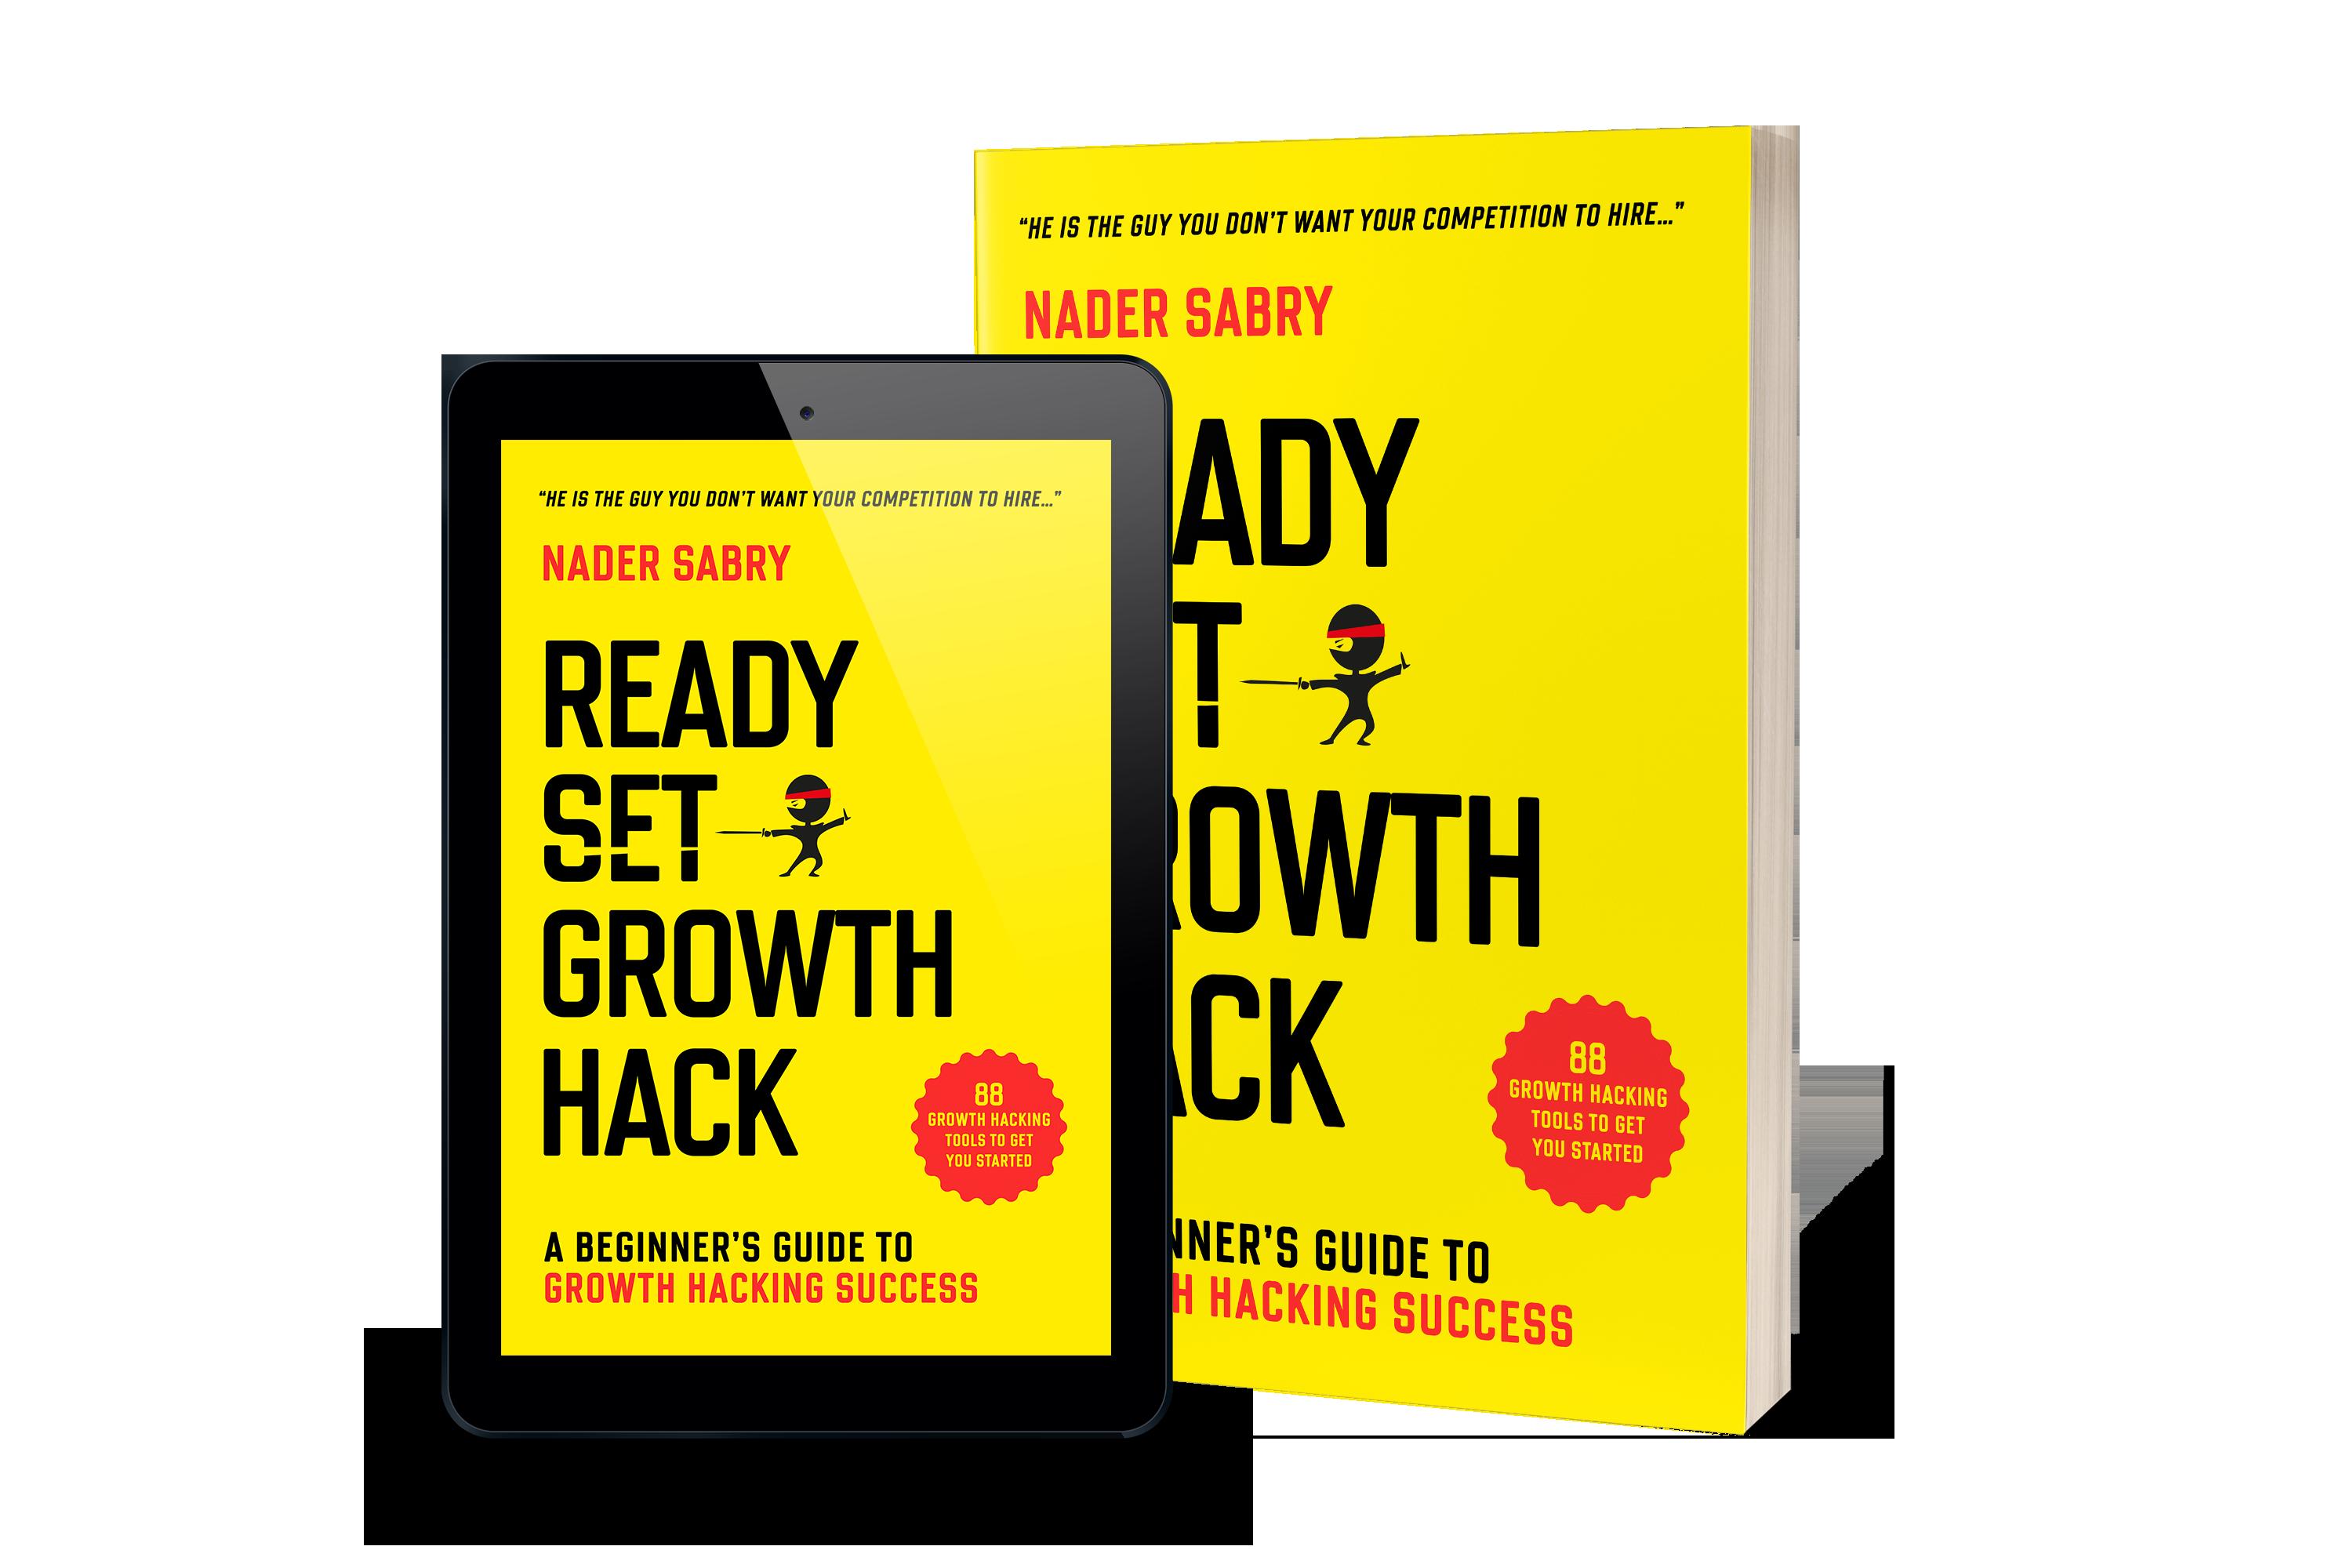 Ready Set Growth Hack